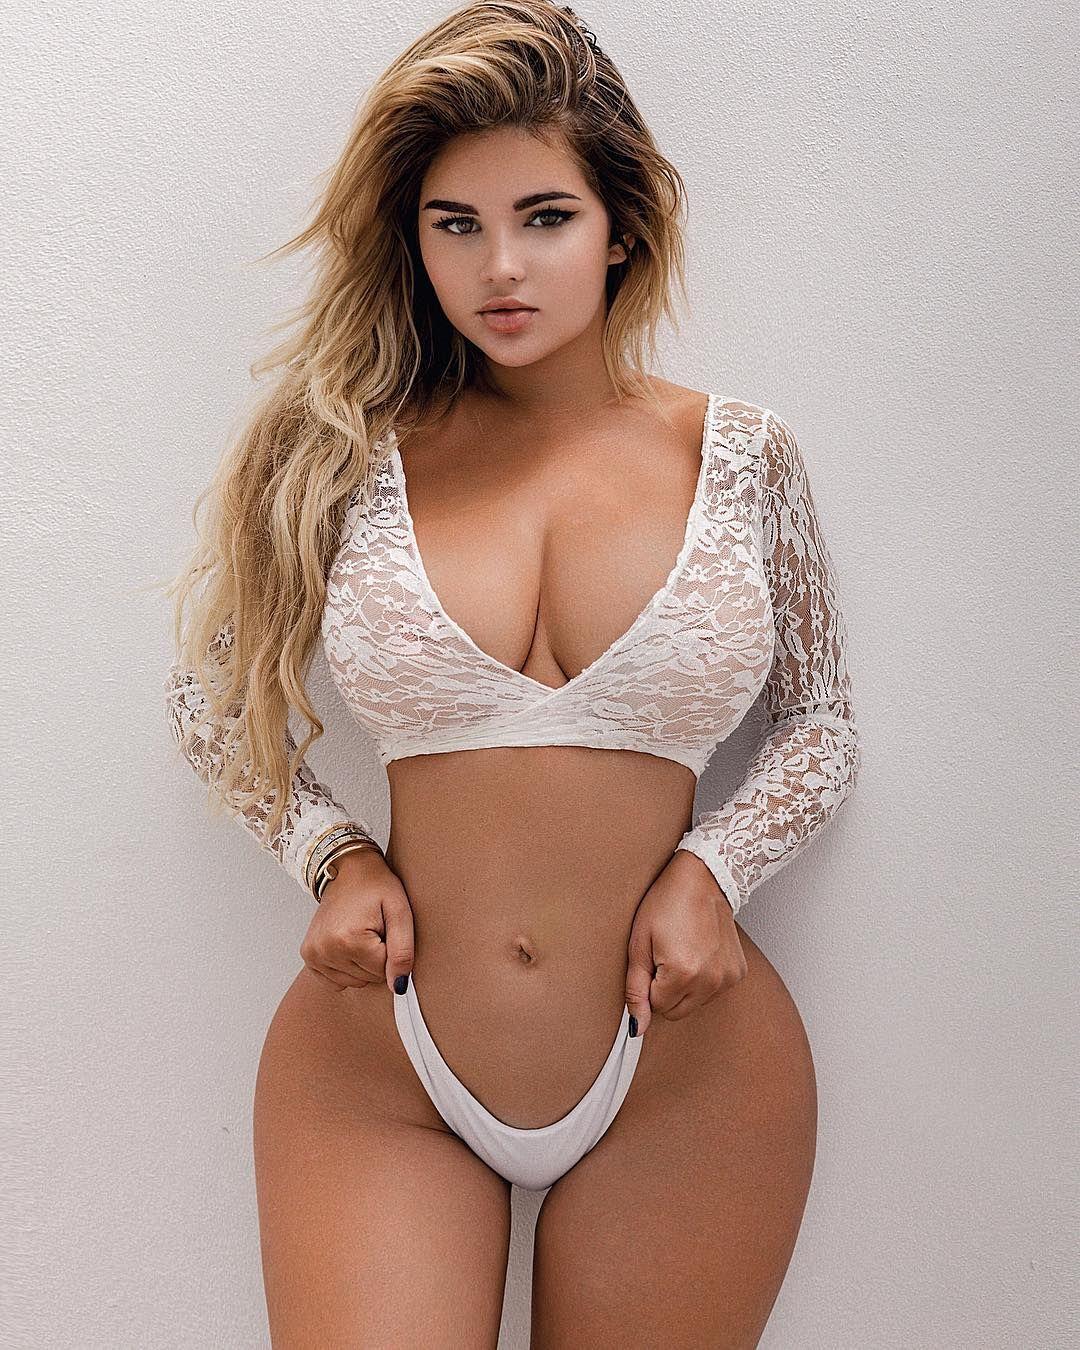 Sexy blonde video